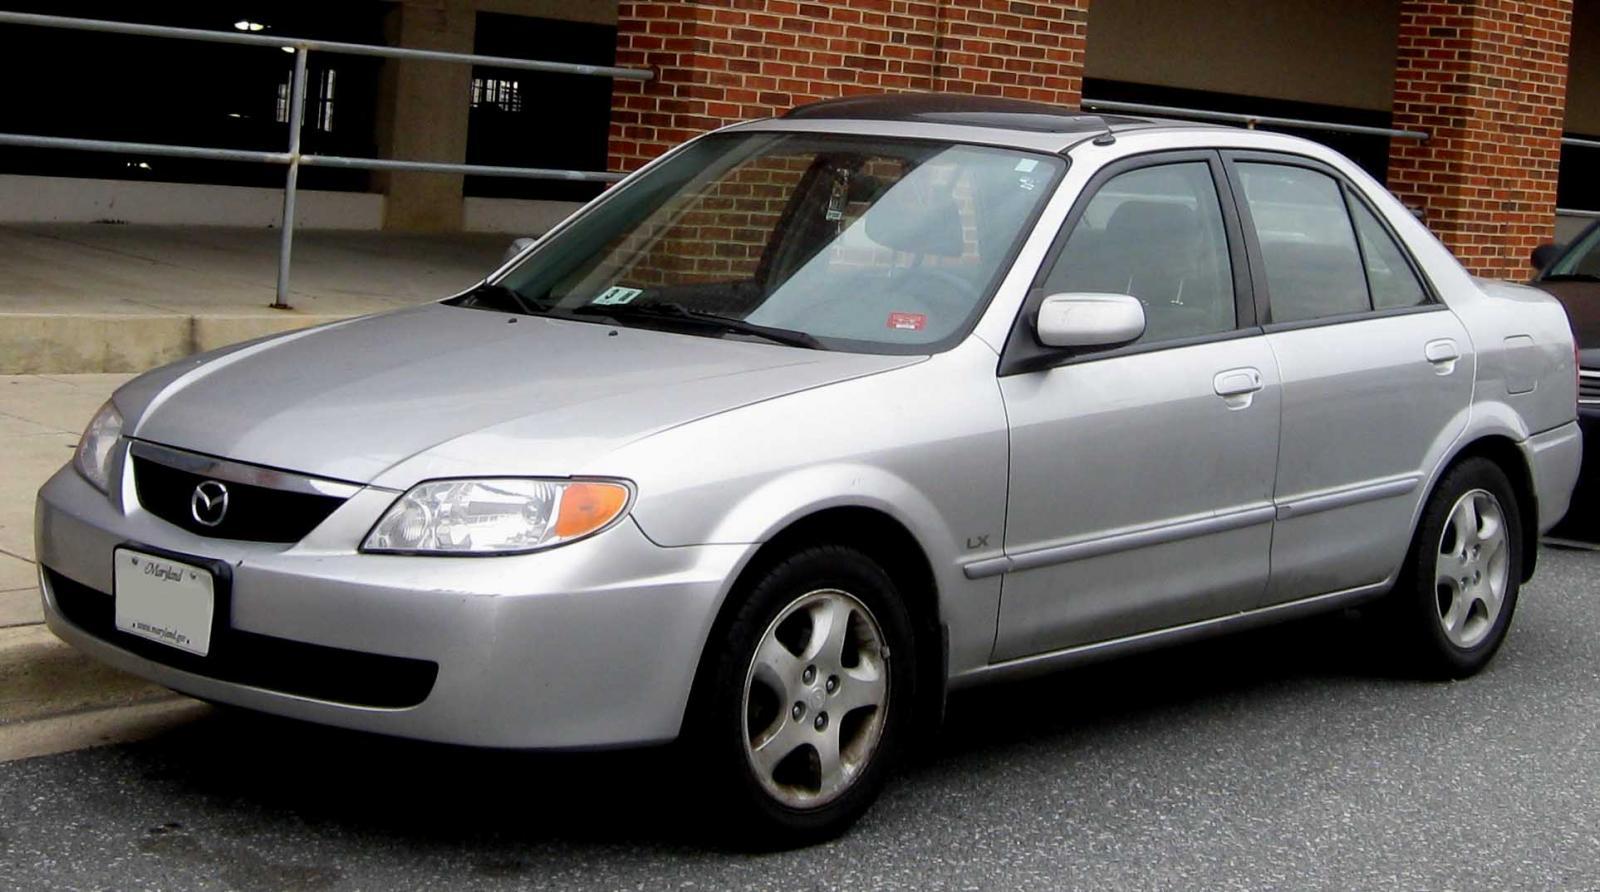 800 1024 1280 1600 origin 2001 Mazda Protege ...